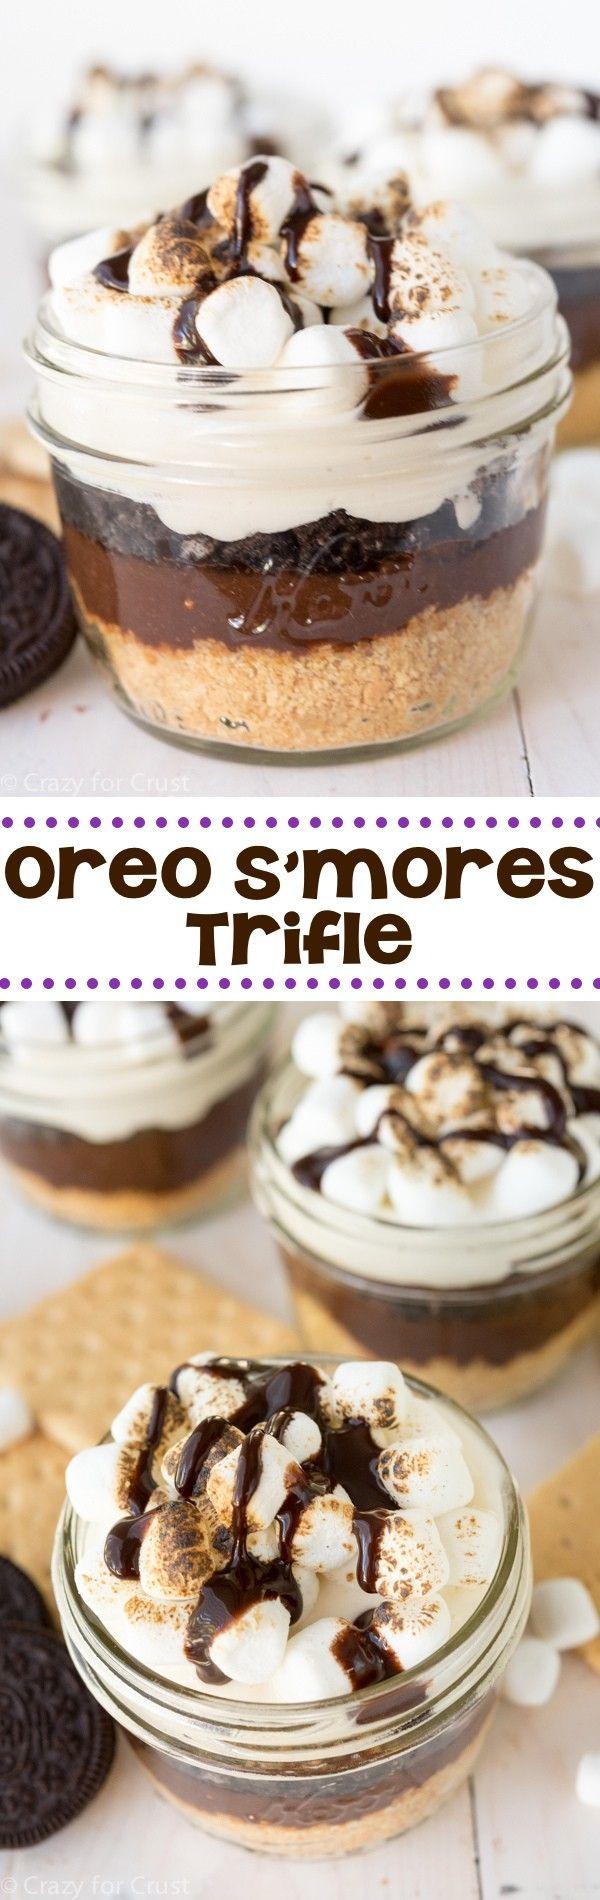 No-Bake Oreo S'mores Trifle ~ Graham cracker crust, chocolate pudding, crushed Oreos, and toasted mini marshmallows!